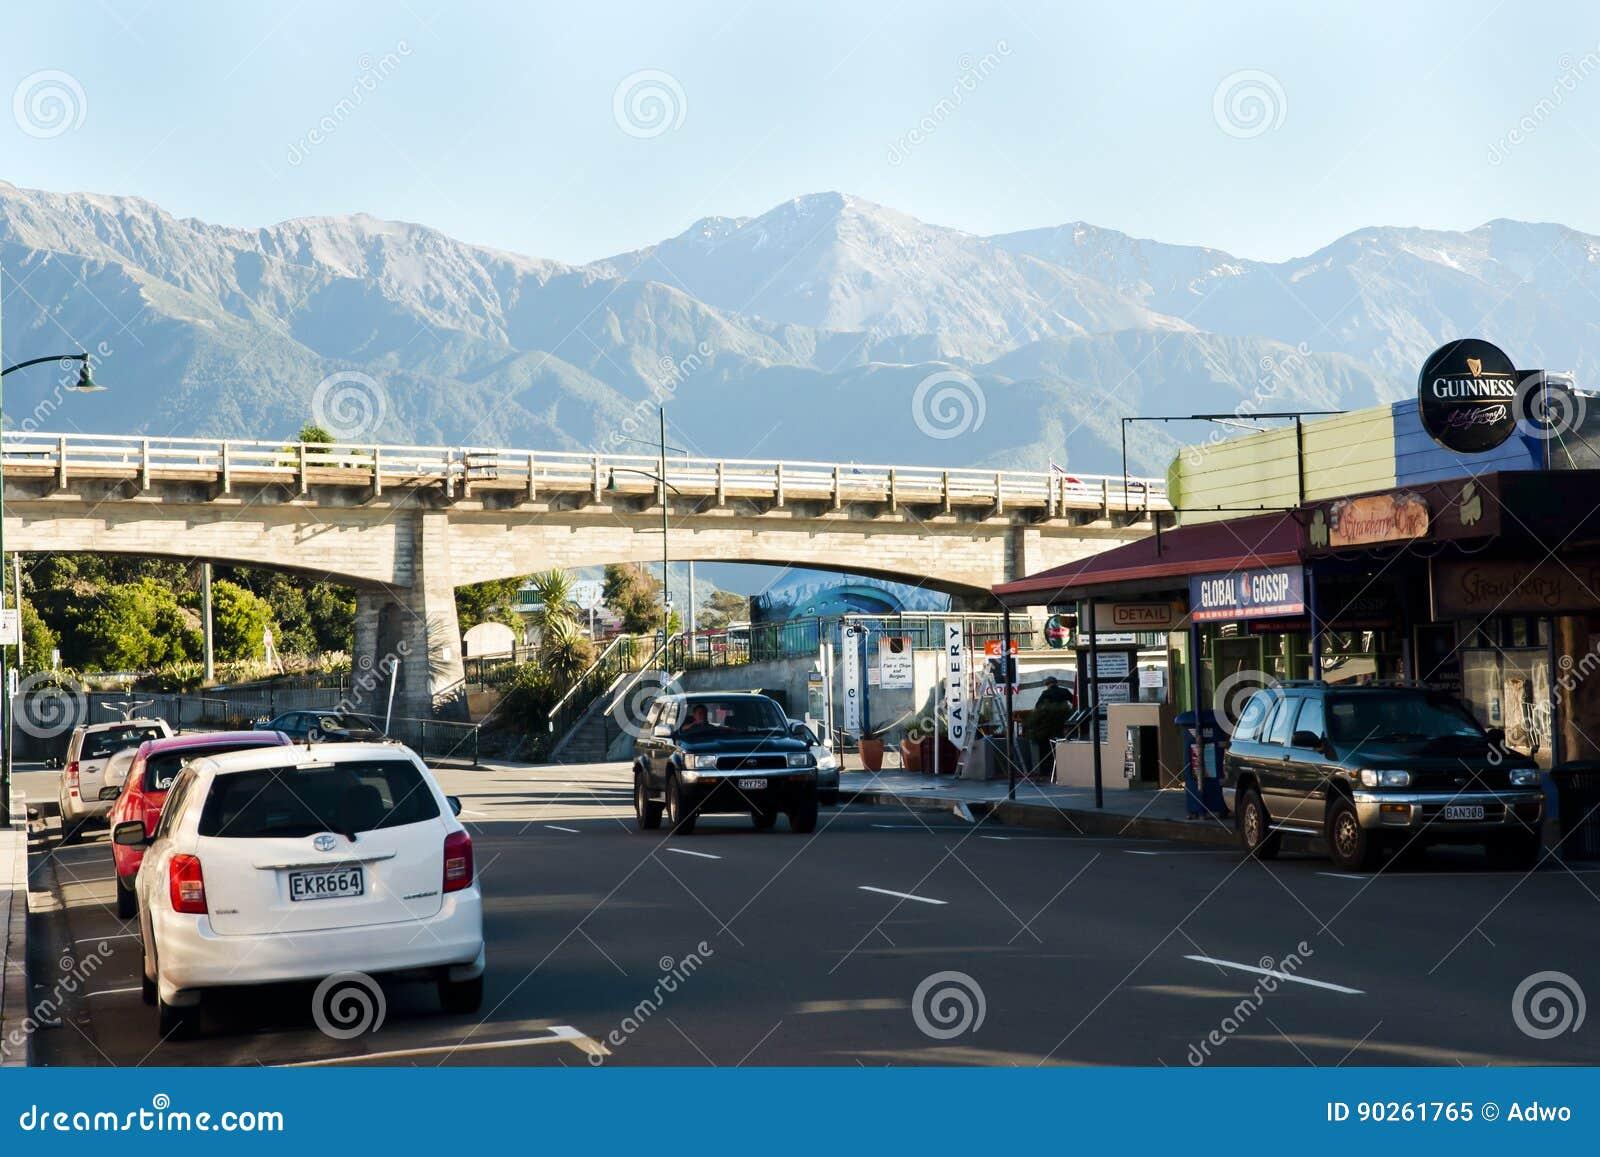 KAIKOURA, NEW ZEALAND - April 3, 2011: